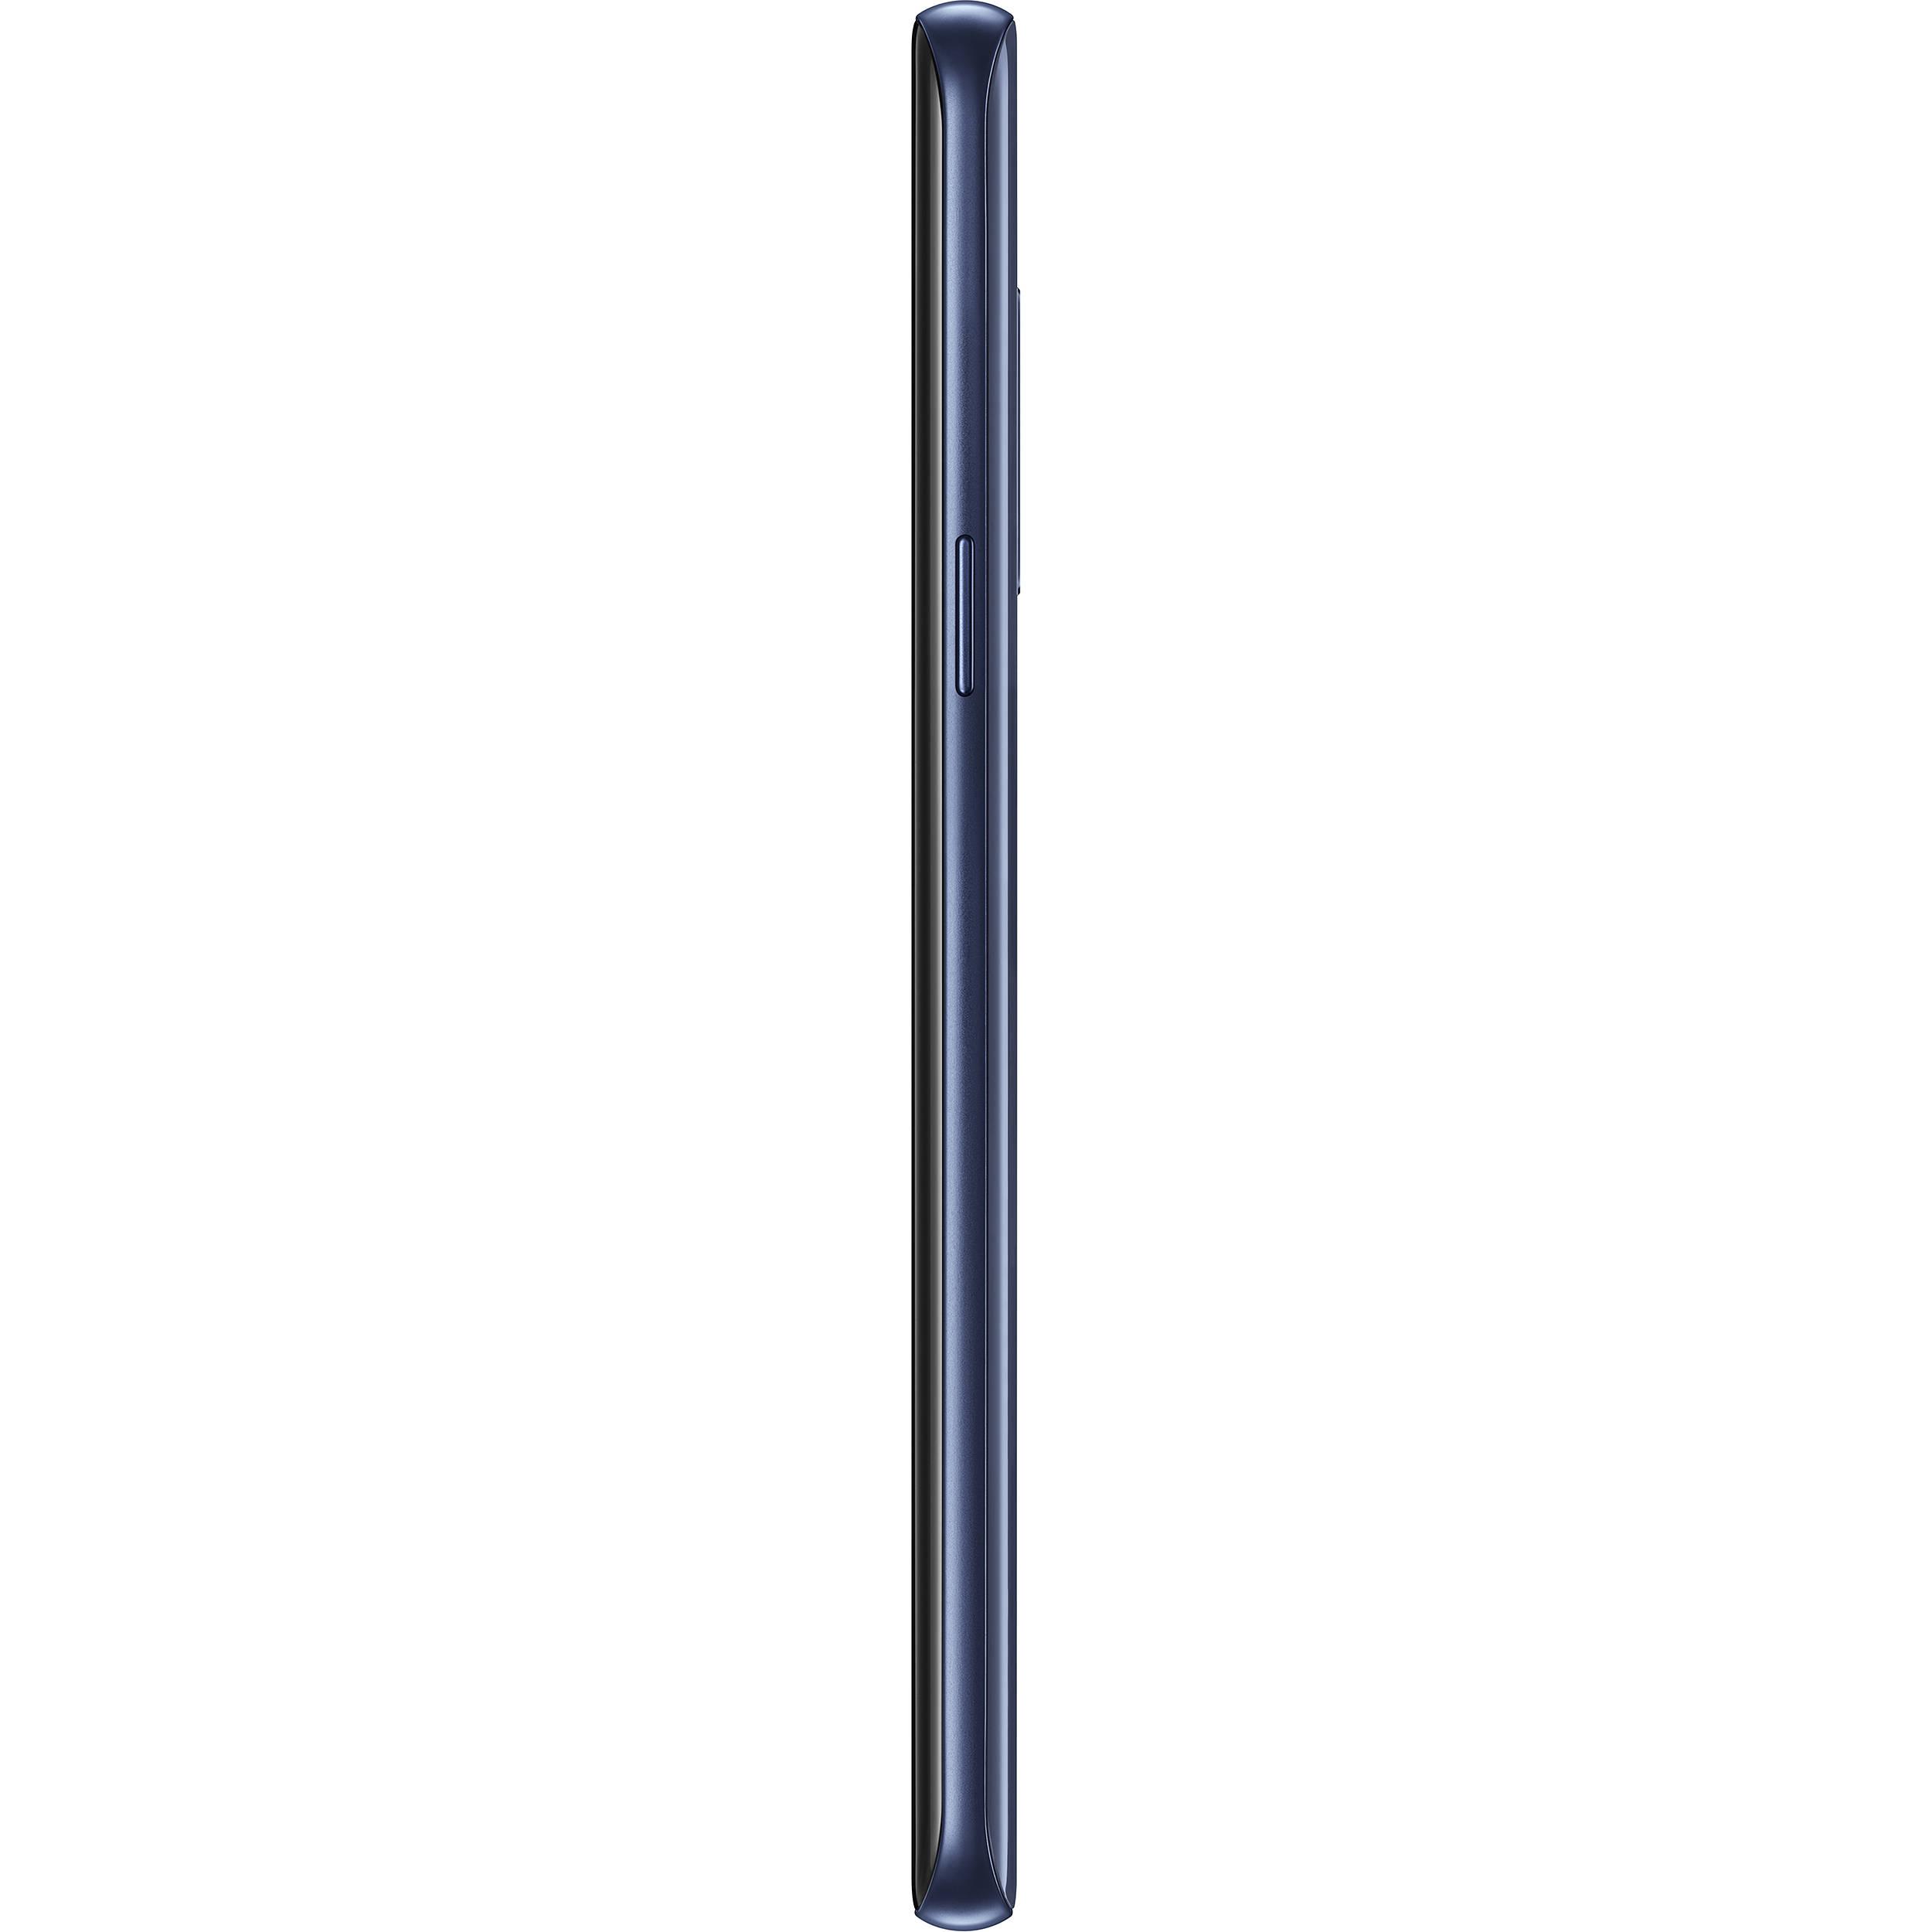 Samsung Galaxy S9 SM-G960U 64GB Smartphone (Unlocked, Coral Blue)